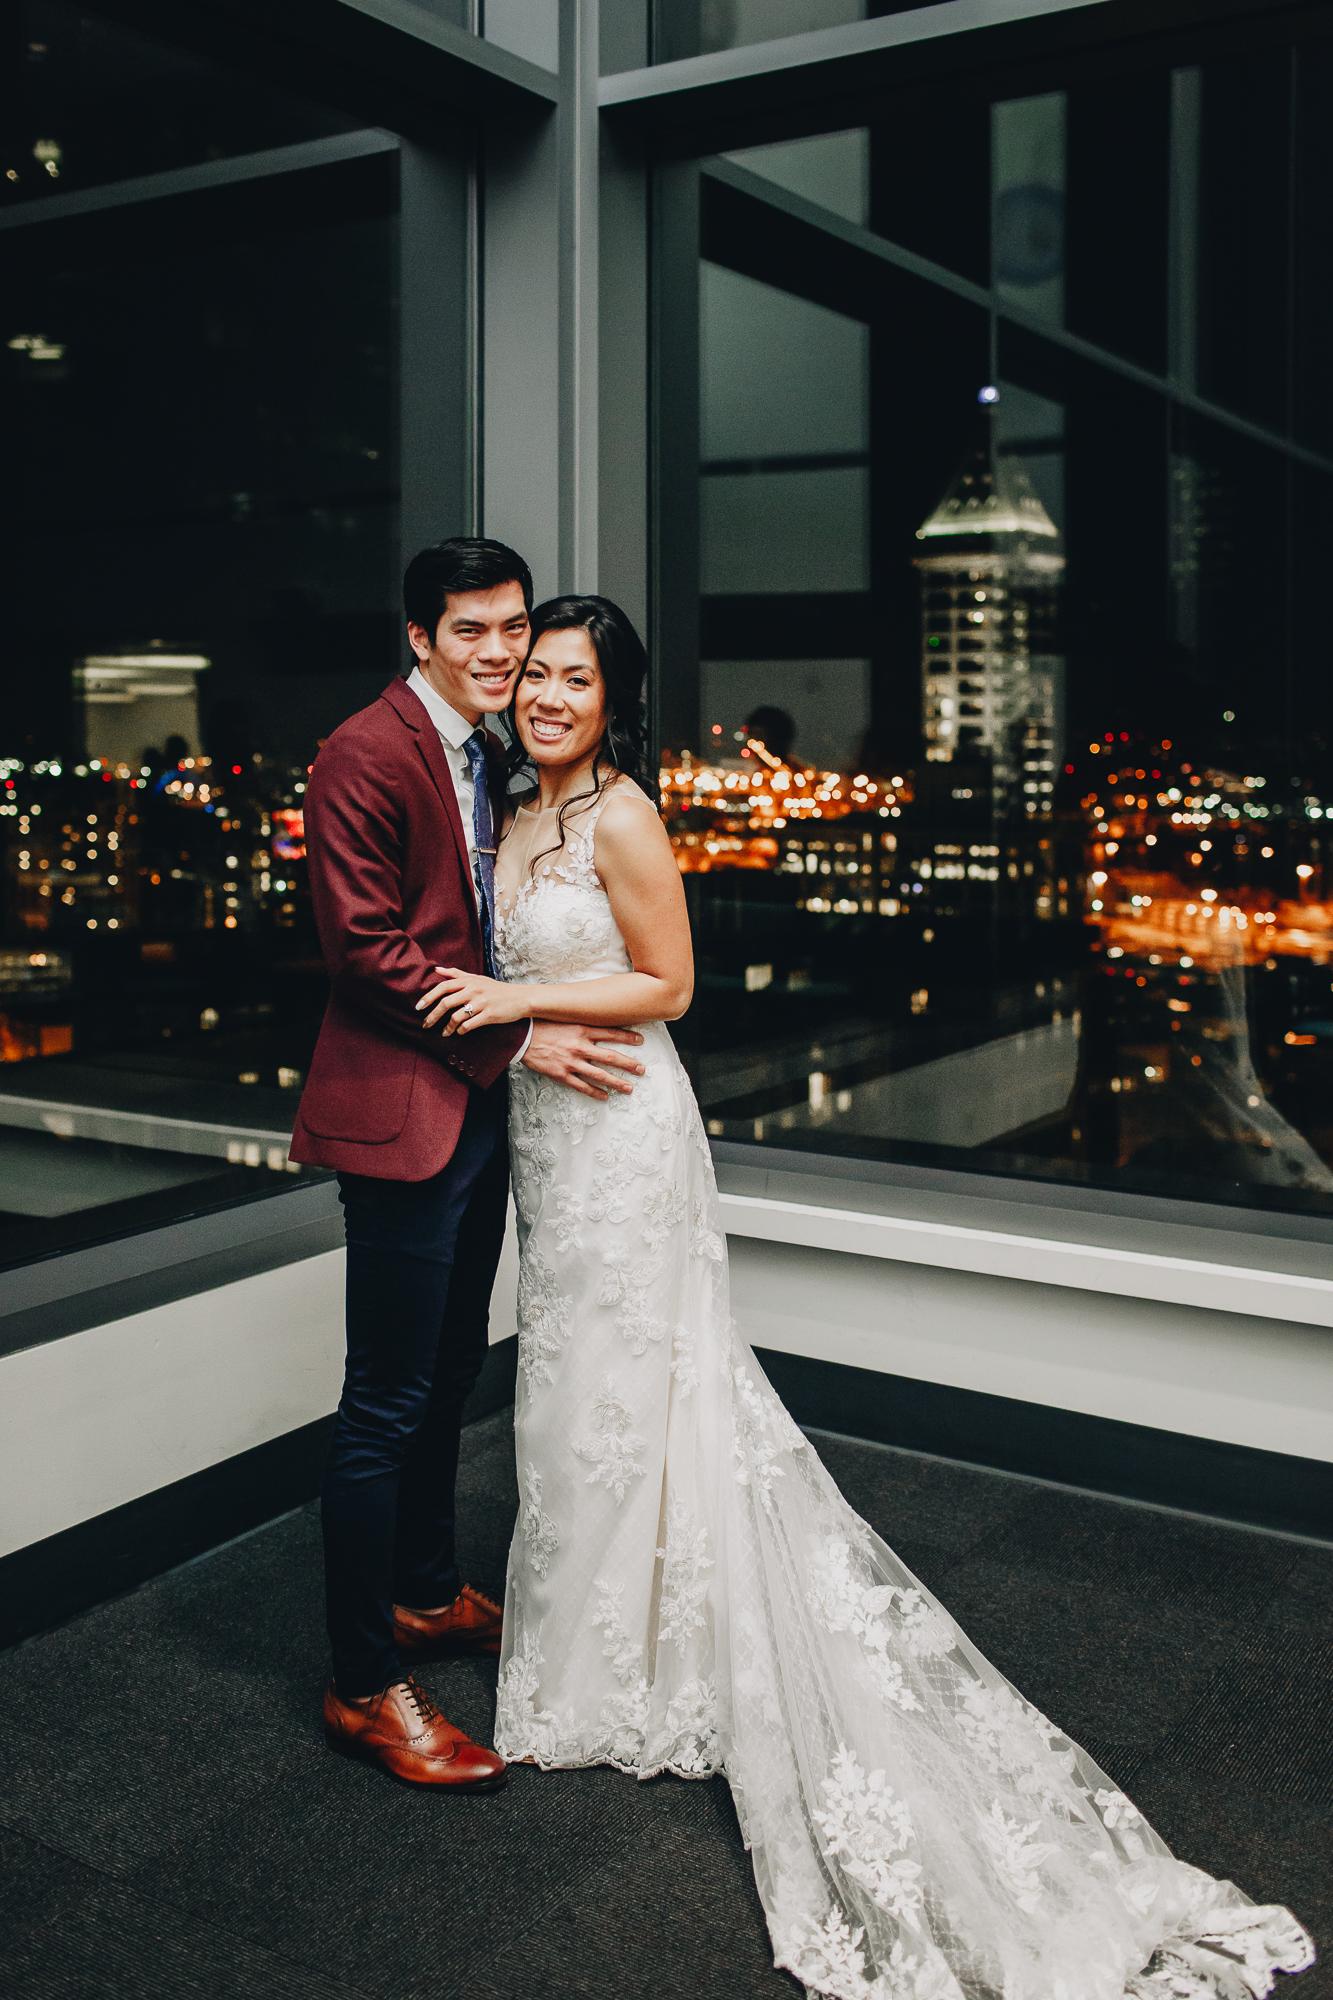 Seattle courthouse wedding photos kristawelch67.jpg